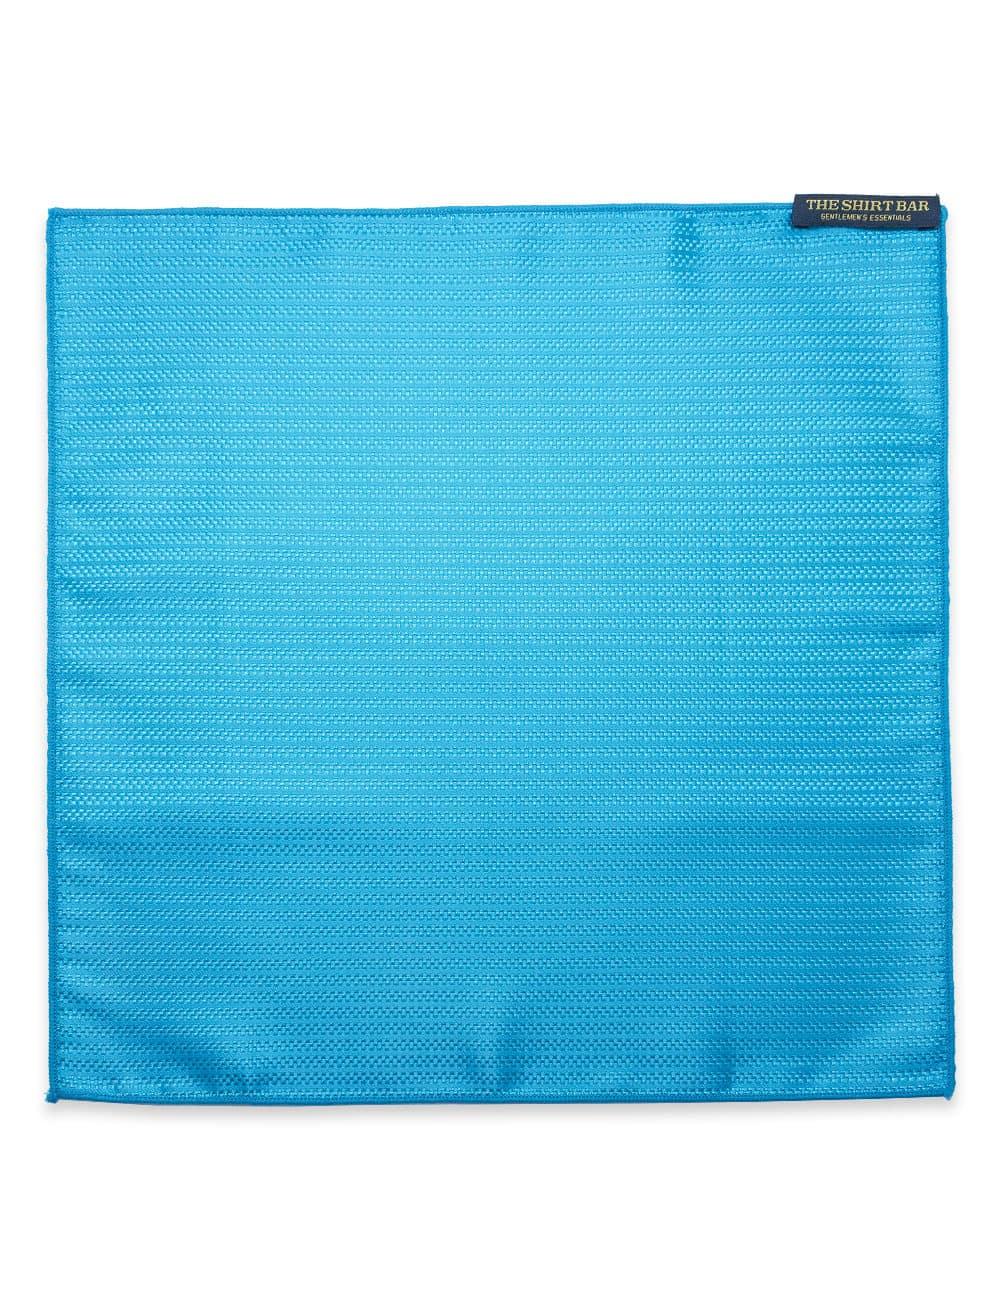 Bright Blue Dobby Woven Pocket Square PSQ57.9